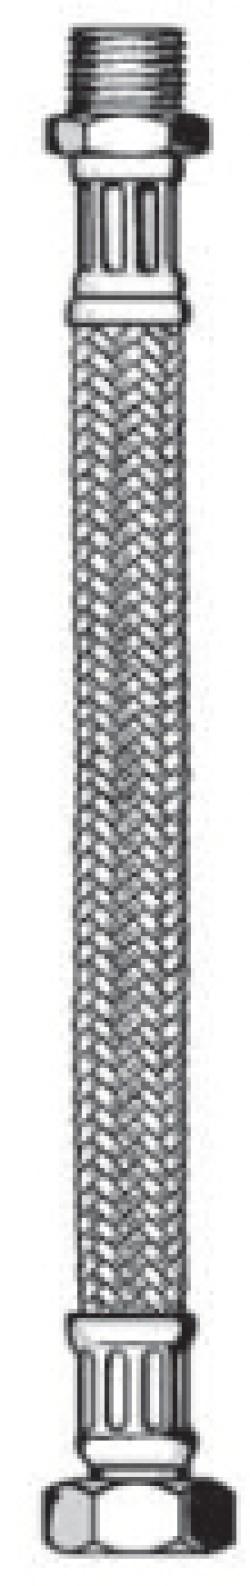 МЕ 5625.1127.80 Meiflex Dn18, 3/4 BPx3/4HP, 800mm